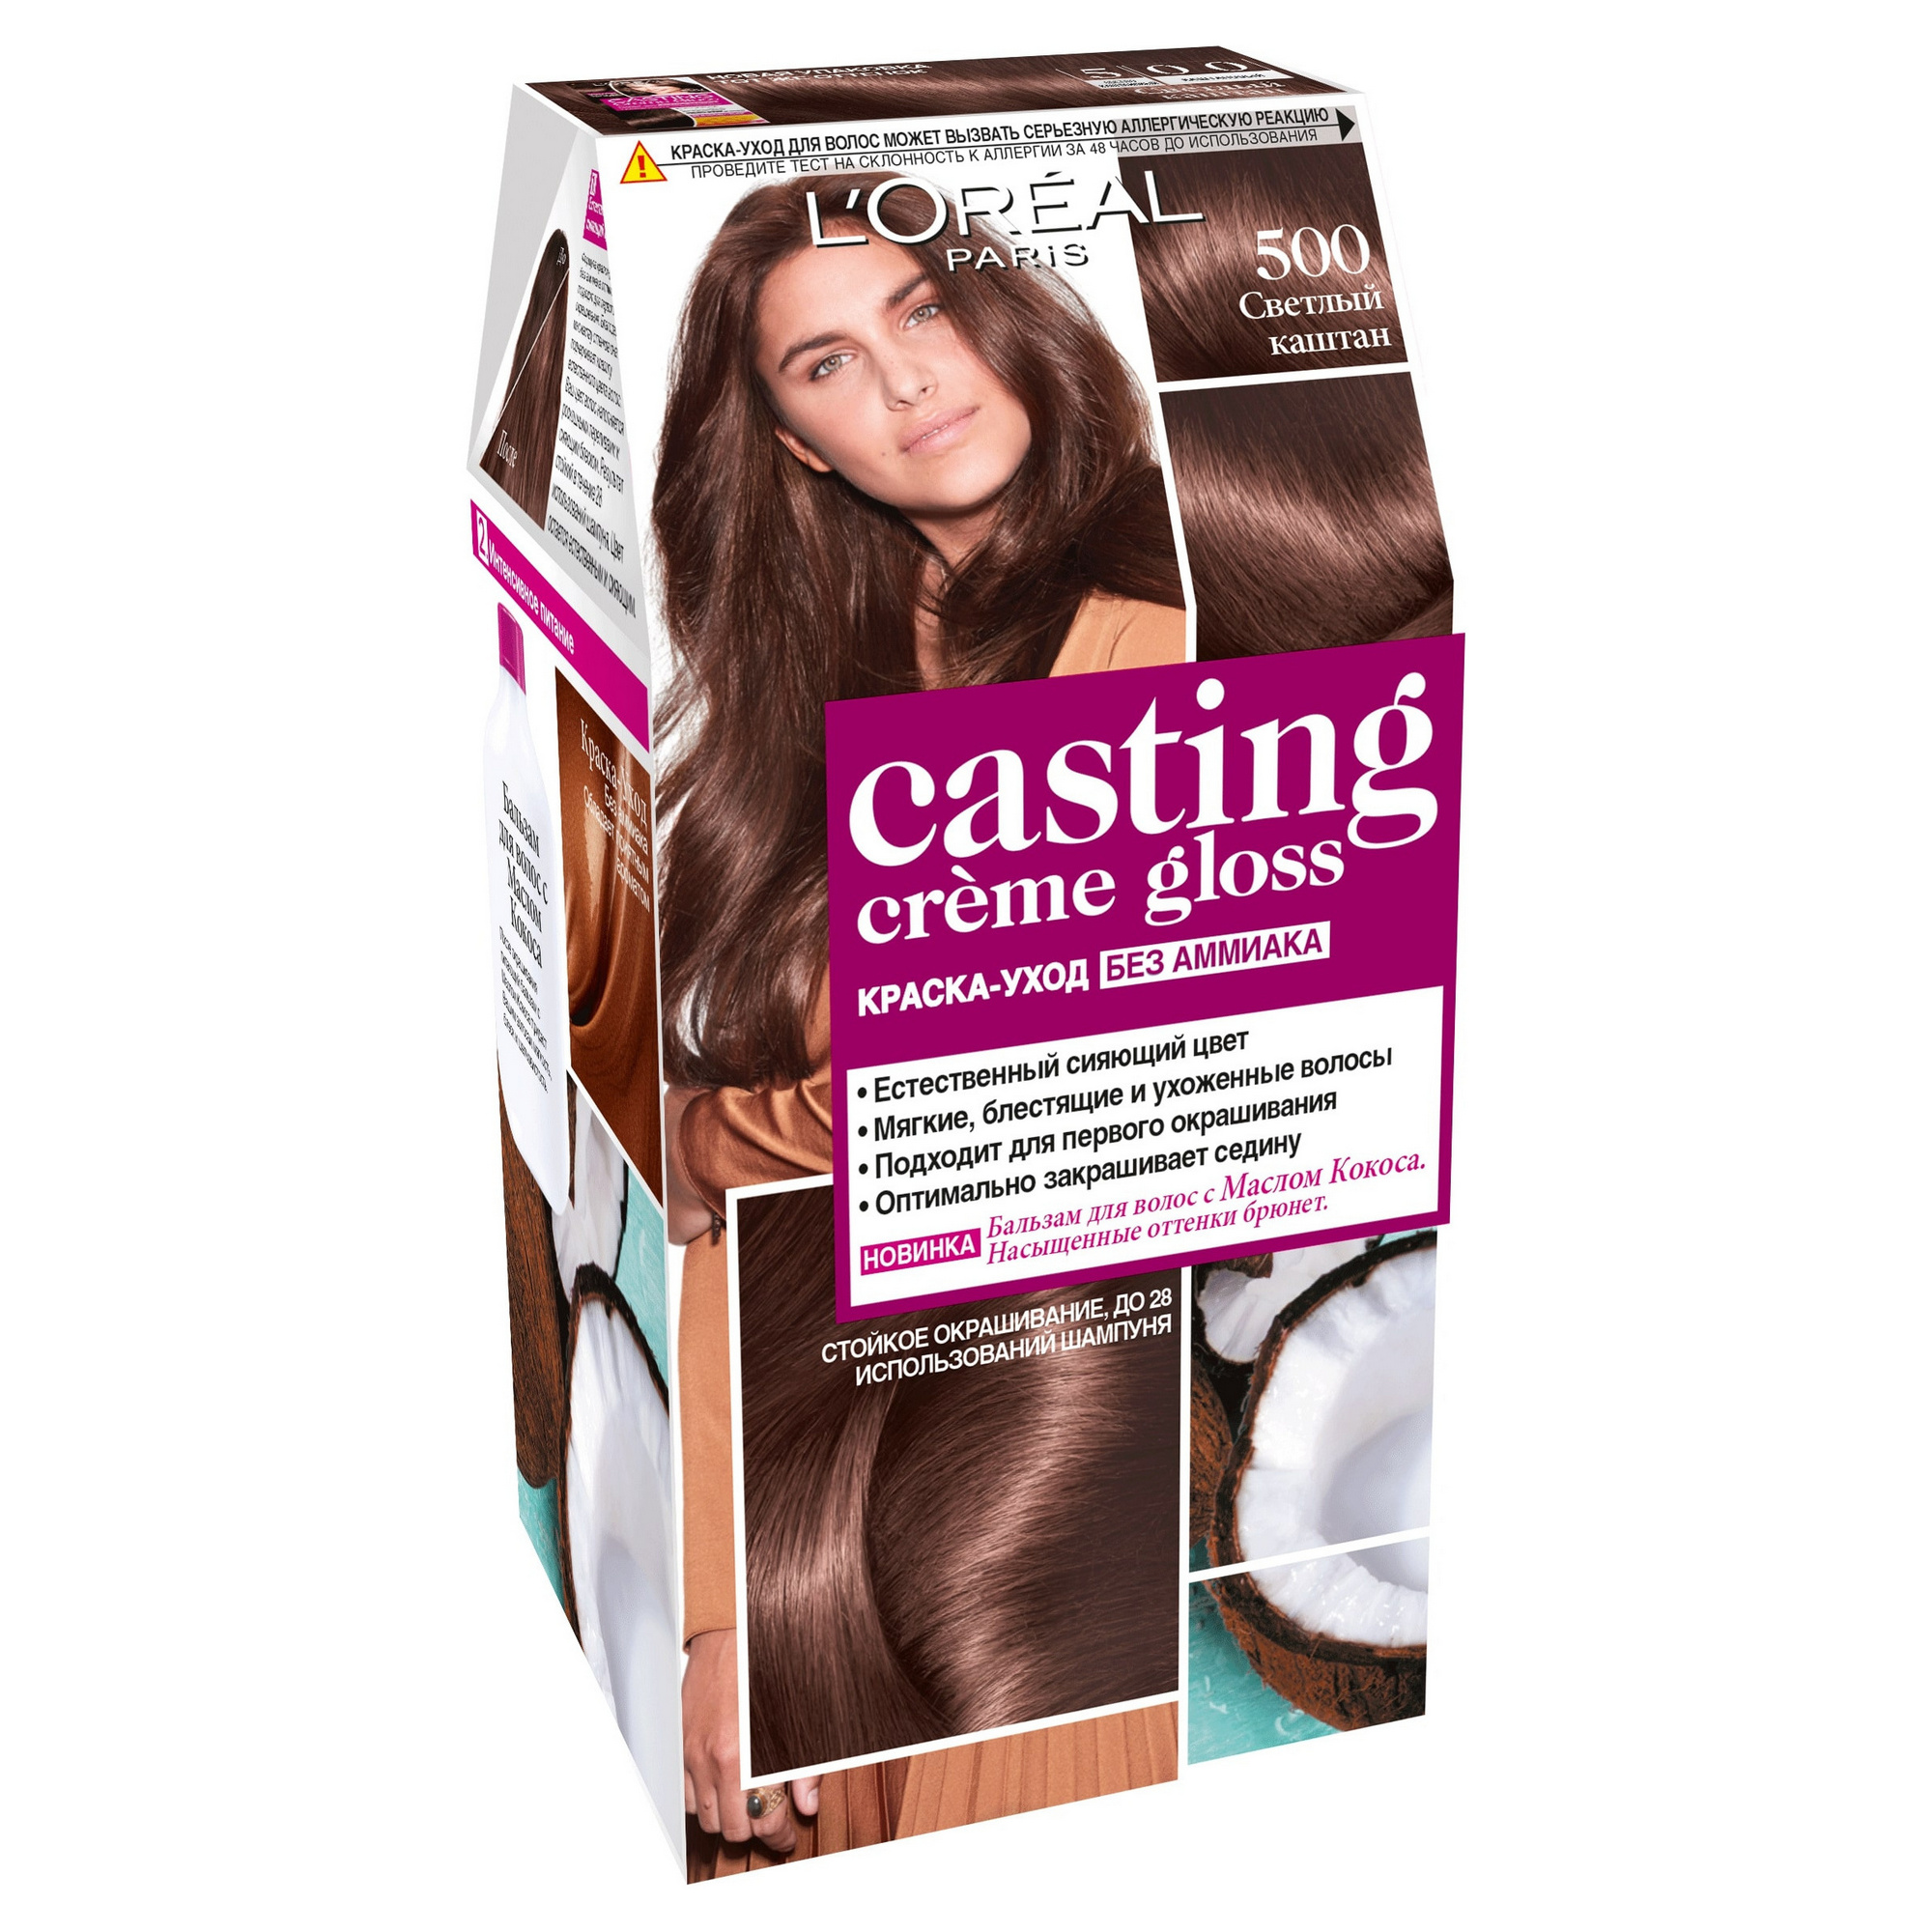 "Миниатюра Краска для волос L'Oreal Paris ""Casting Creme Gloss"" 500 Светлый каштан 150 мл №1"